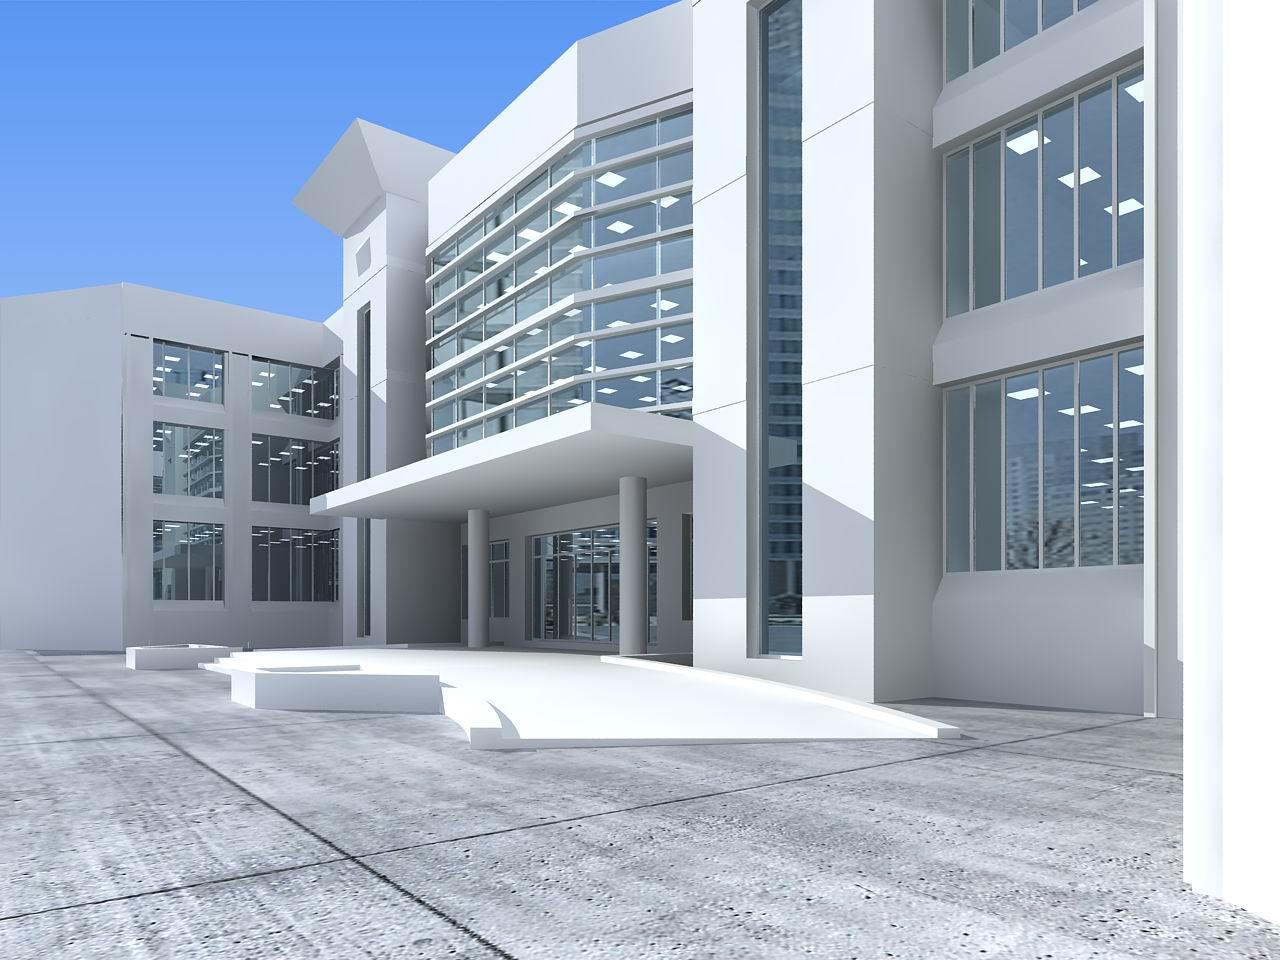 architecture 025 3d model 3ds max 141667